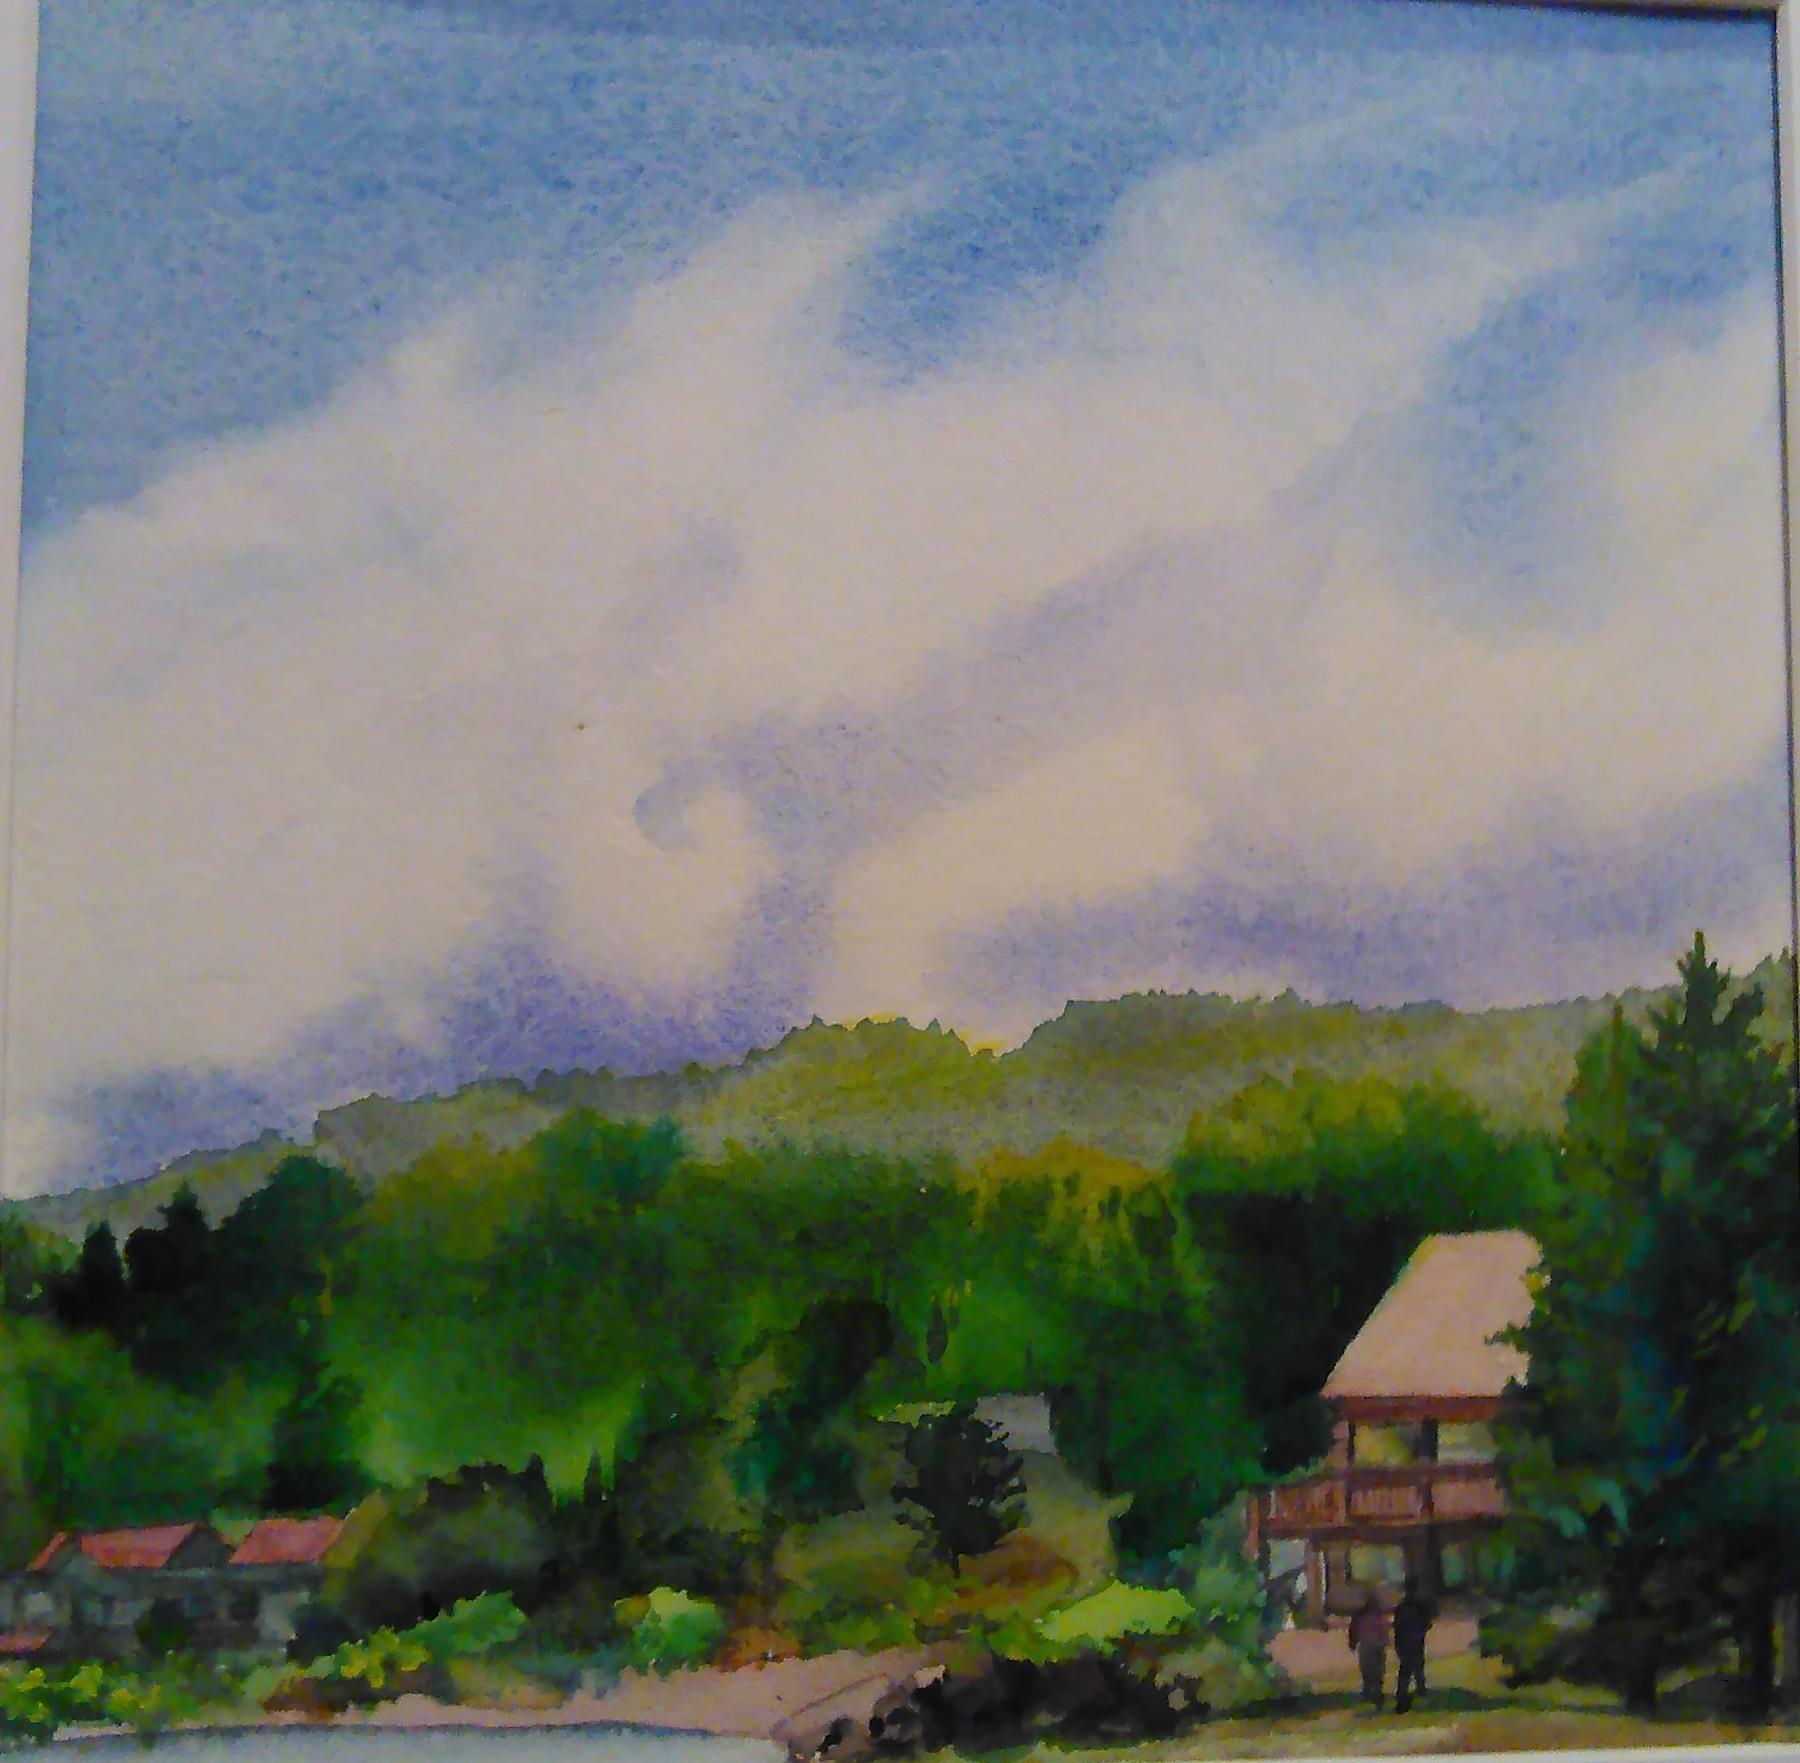 Clouds Over Grand Marais by Julia Jaakola